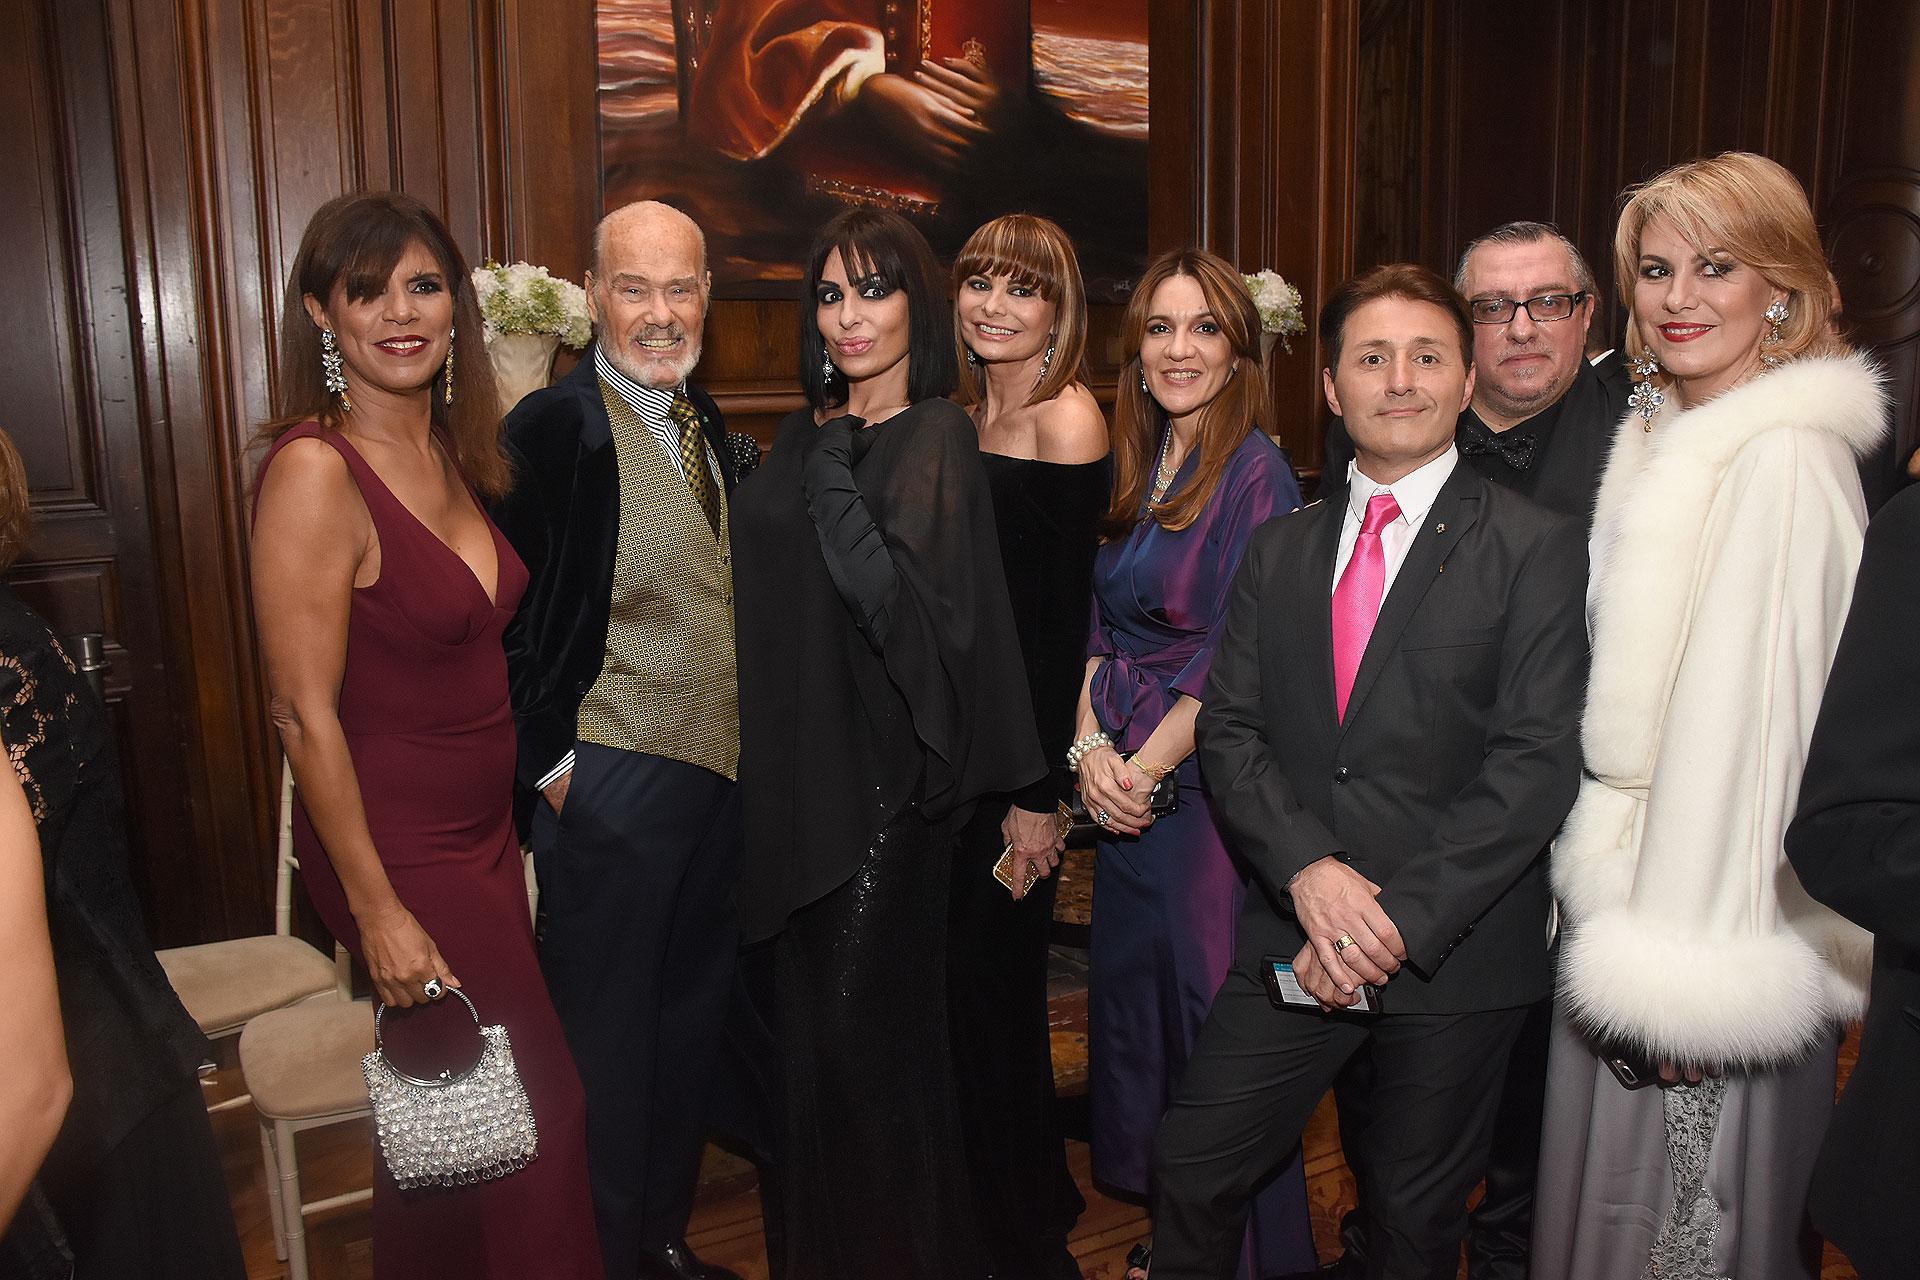 Anamá Ferreira, Gino Bogani, Daniela Cardone, Lucía Miranda, Daniel Gómez Rinaldi, Javier Musetti y Florencia Florio